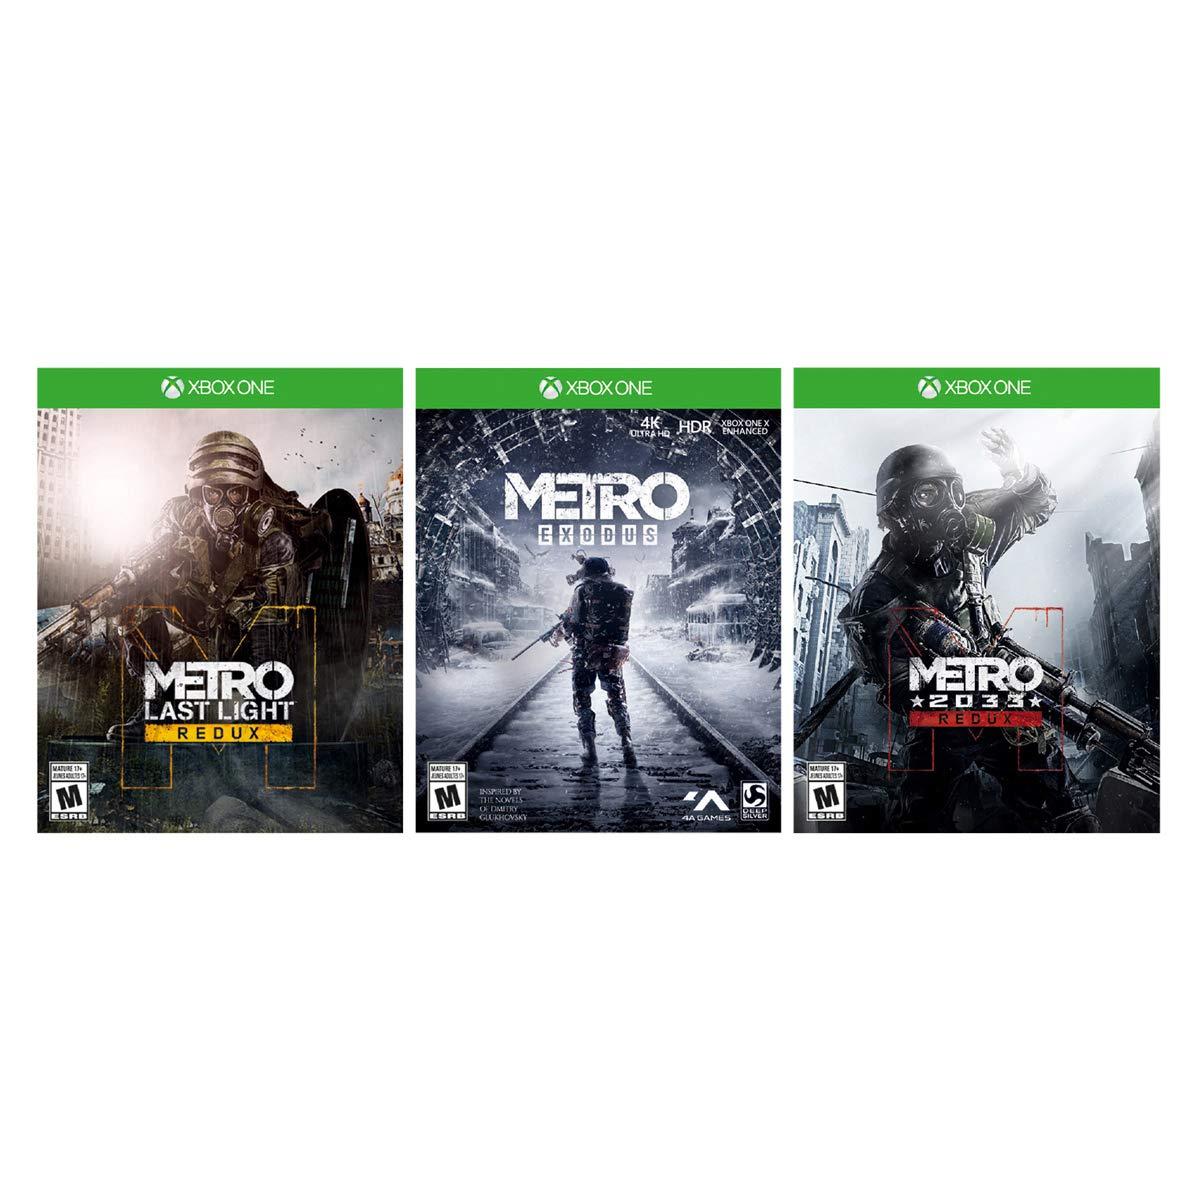 Xbox One X 1TB Console - Metro Exodus Bundle by Microsoft (Image #3)